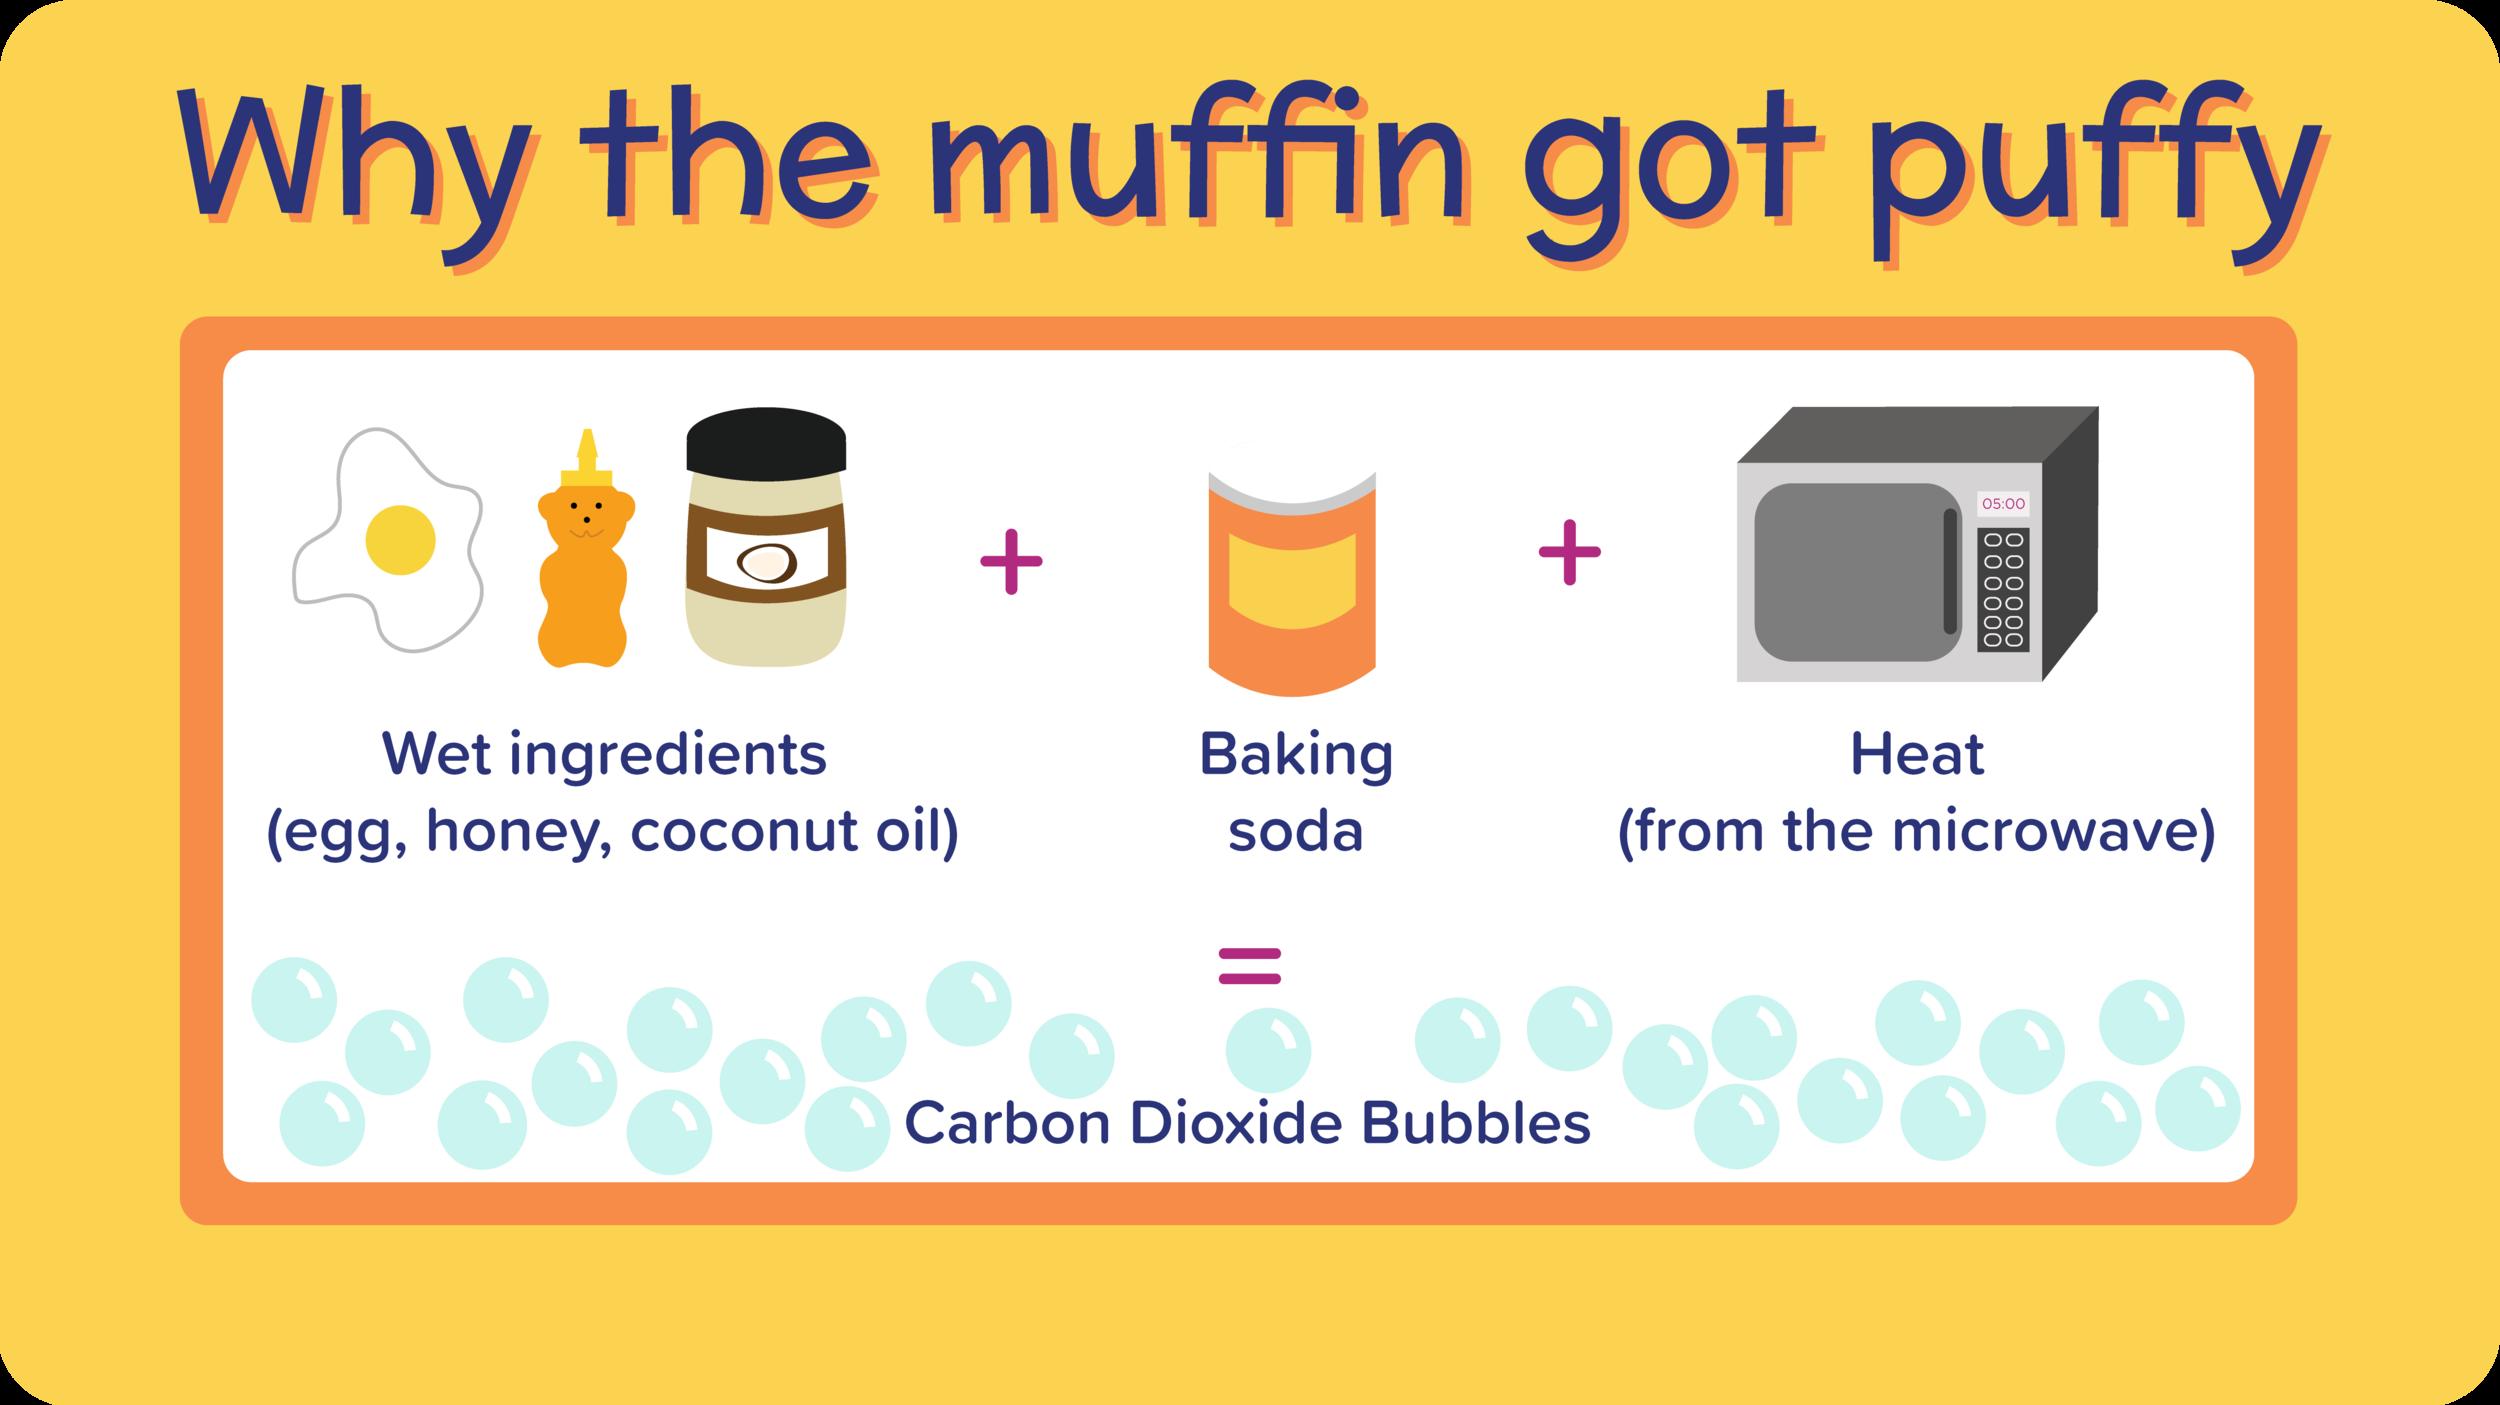 24_BlueberryMugMuffin_why the muffin got puffy-01.png